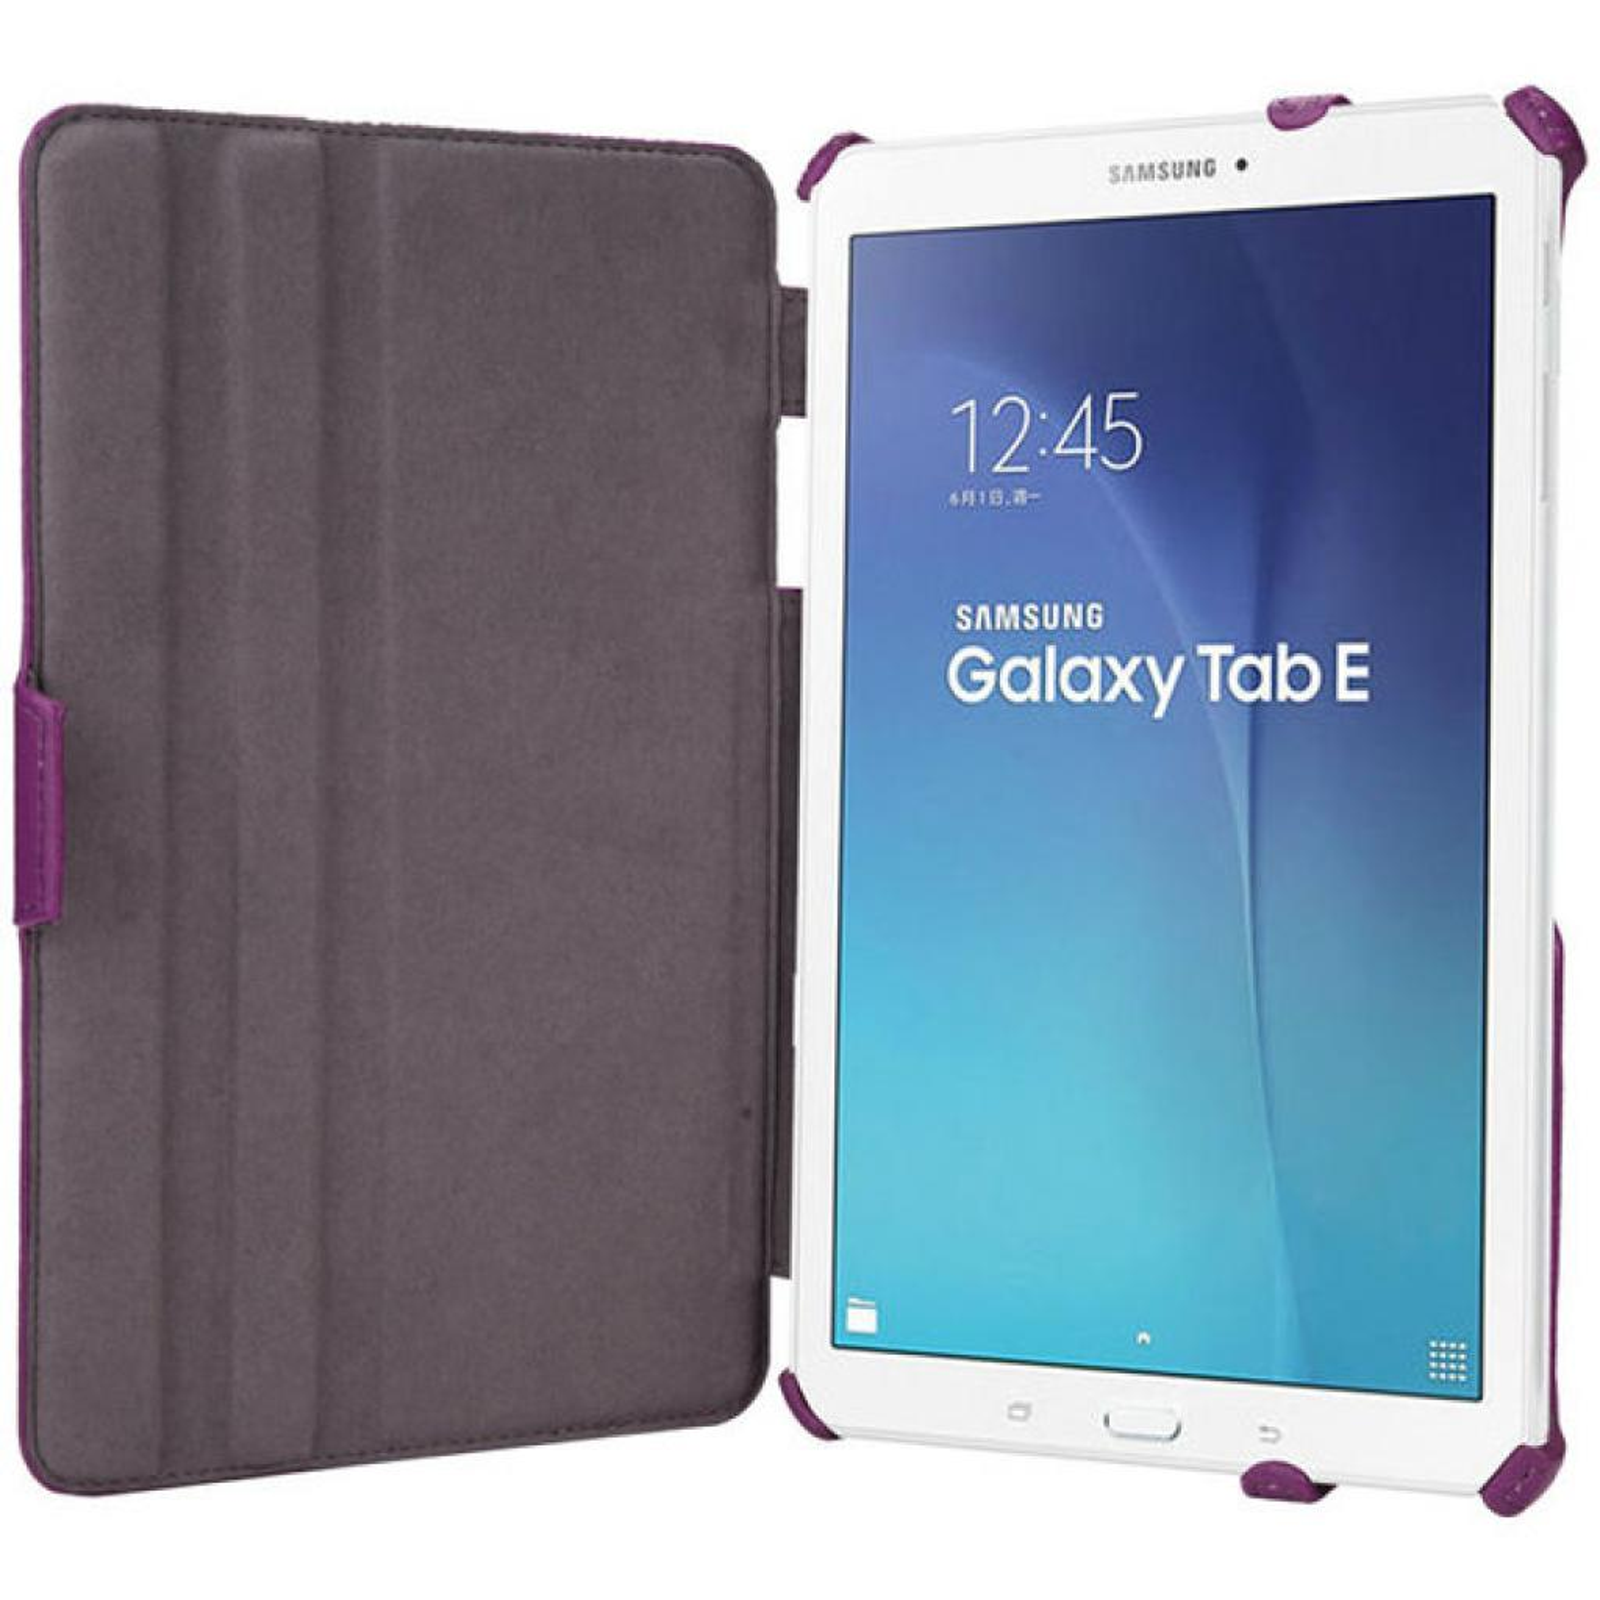 Чехол для планшета AirOn для Samsung Galaxy Tab E 9.6 vio (4822352776329) изображение 8